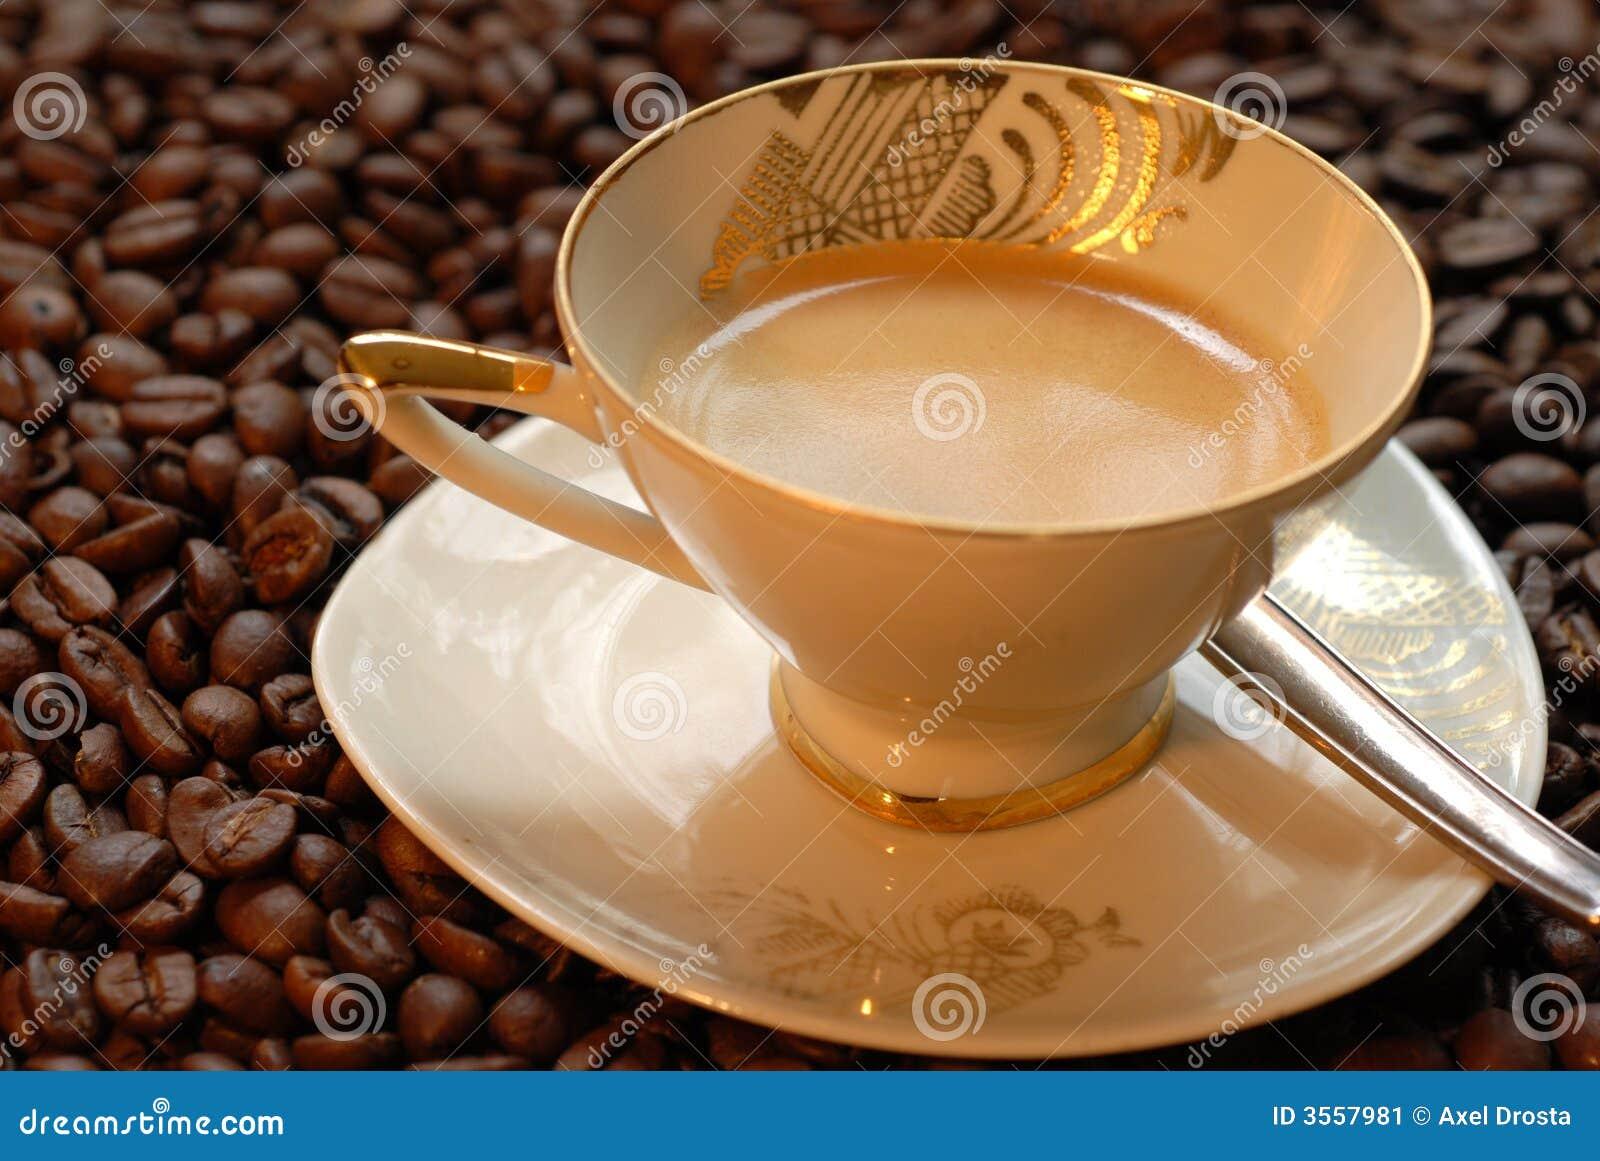 Vecchia tazza di caffè